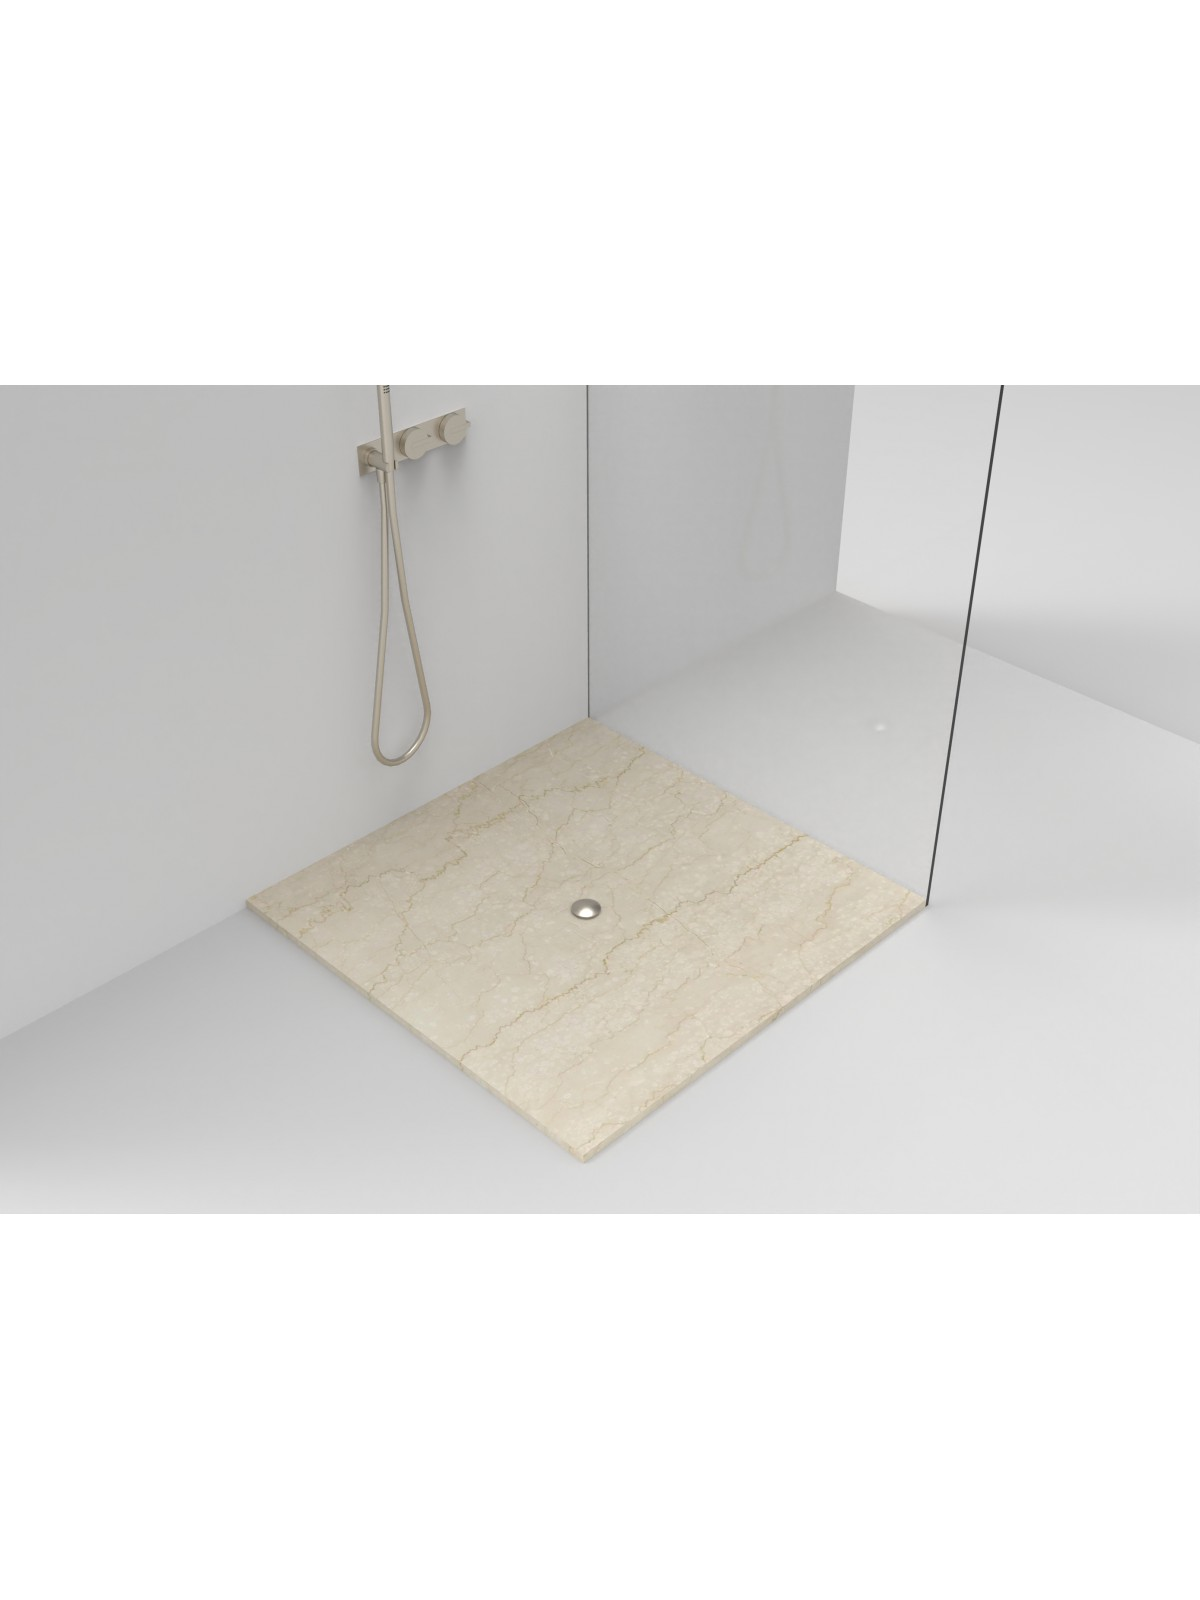 Marmor Duschplatte mit mittlerem Abfluss I Botticino